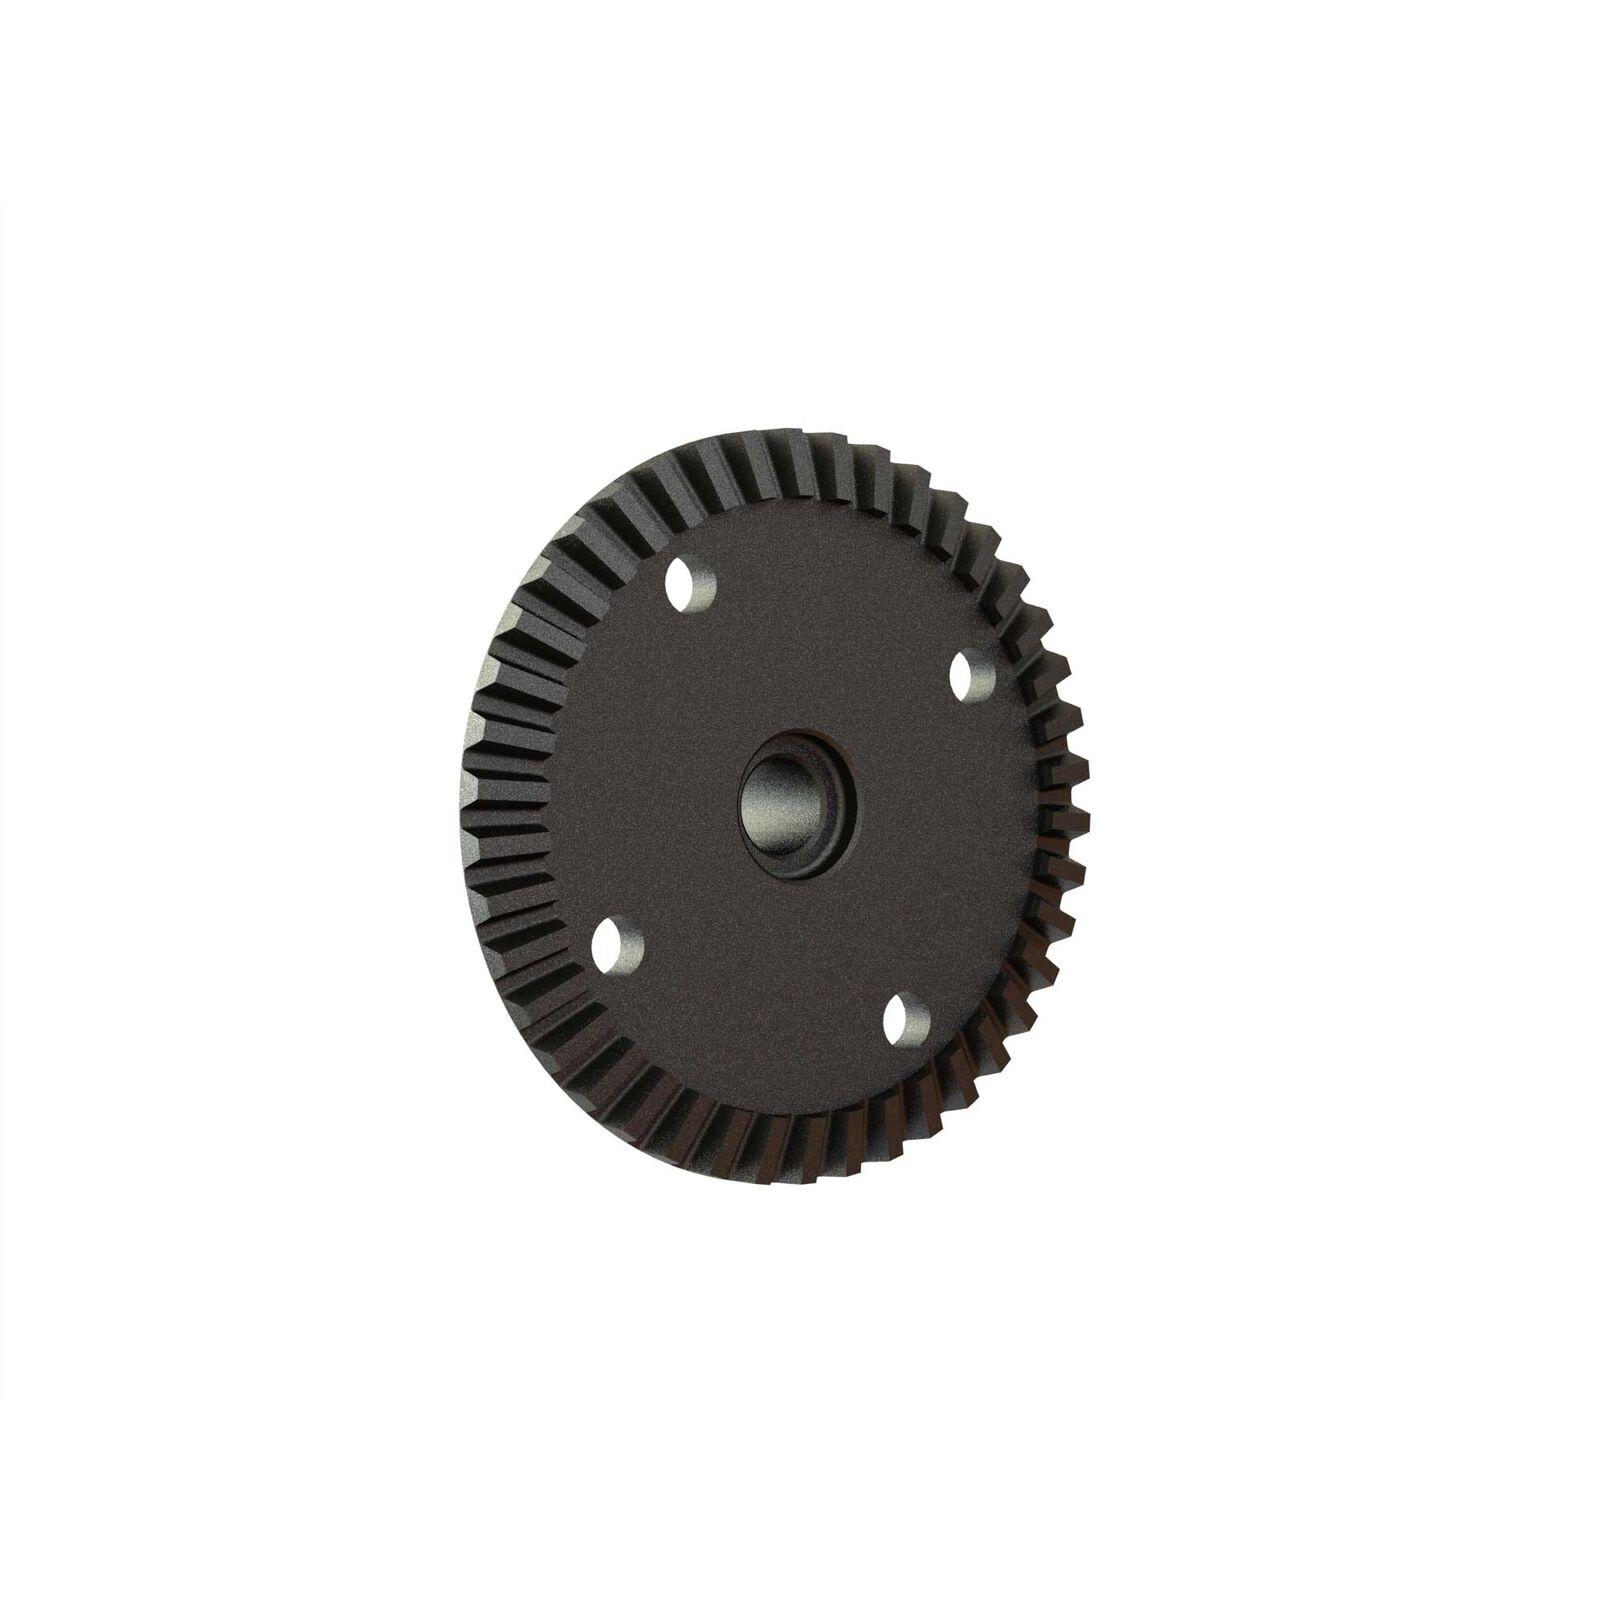 Main Diff Gear, 42T GP5